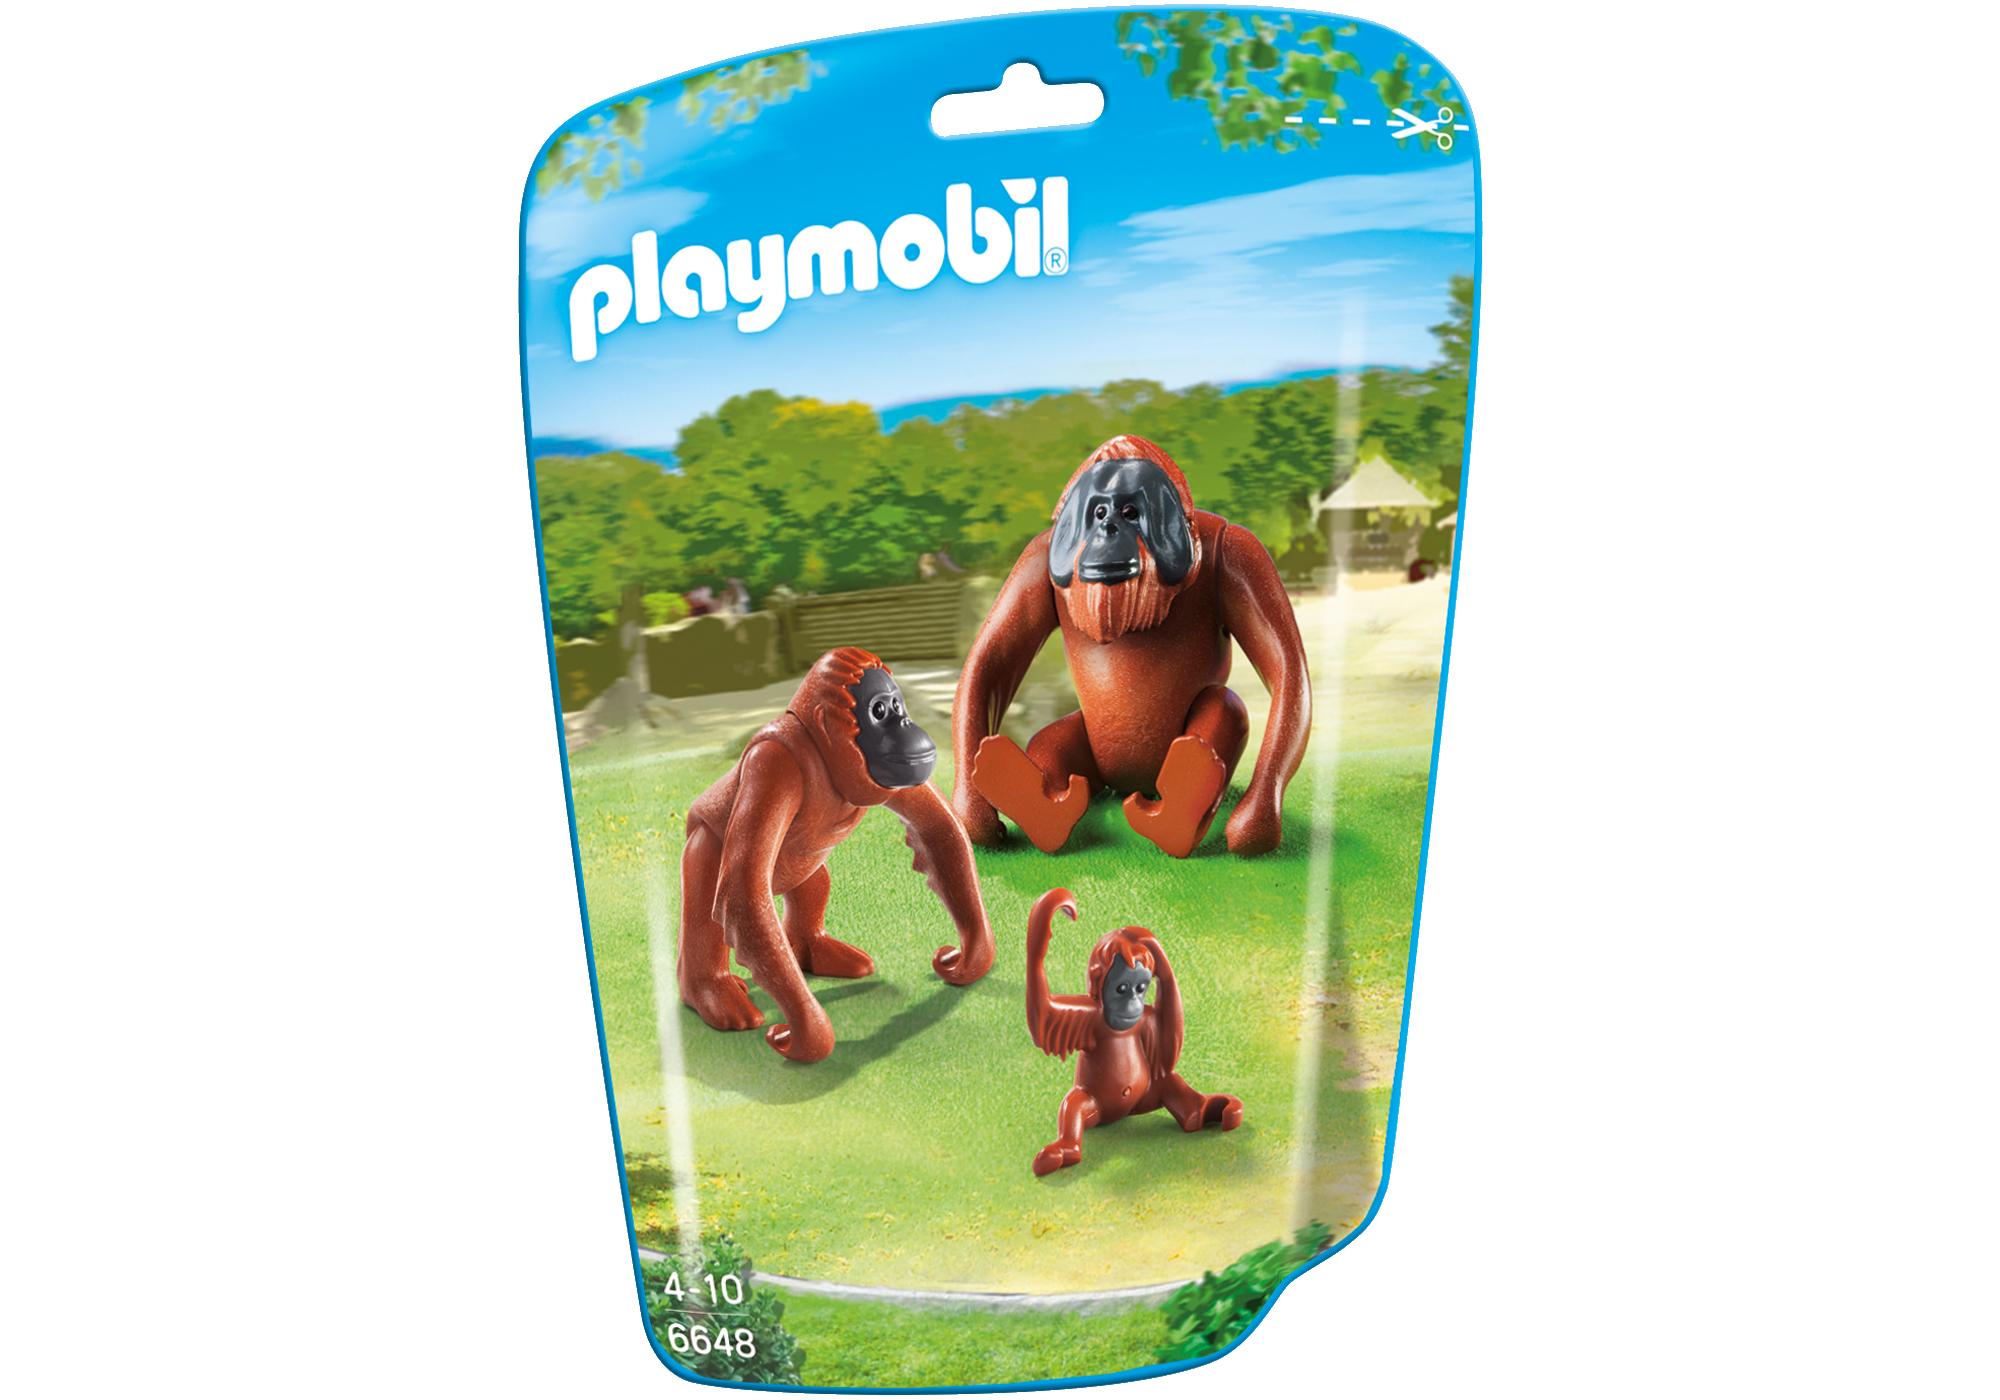 http://media.playmobil.com/i/playmobil/6648_product_box_front/Orangutan Family